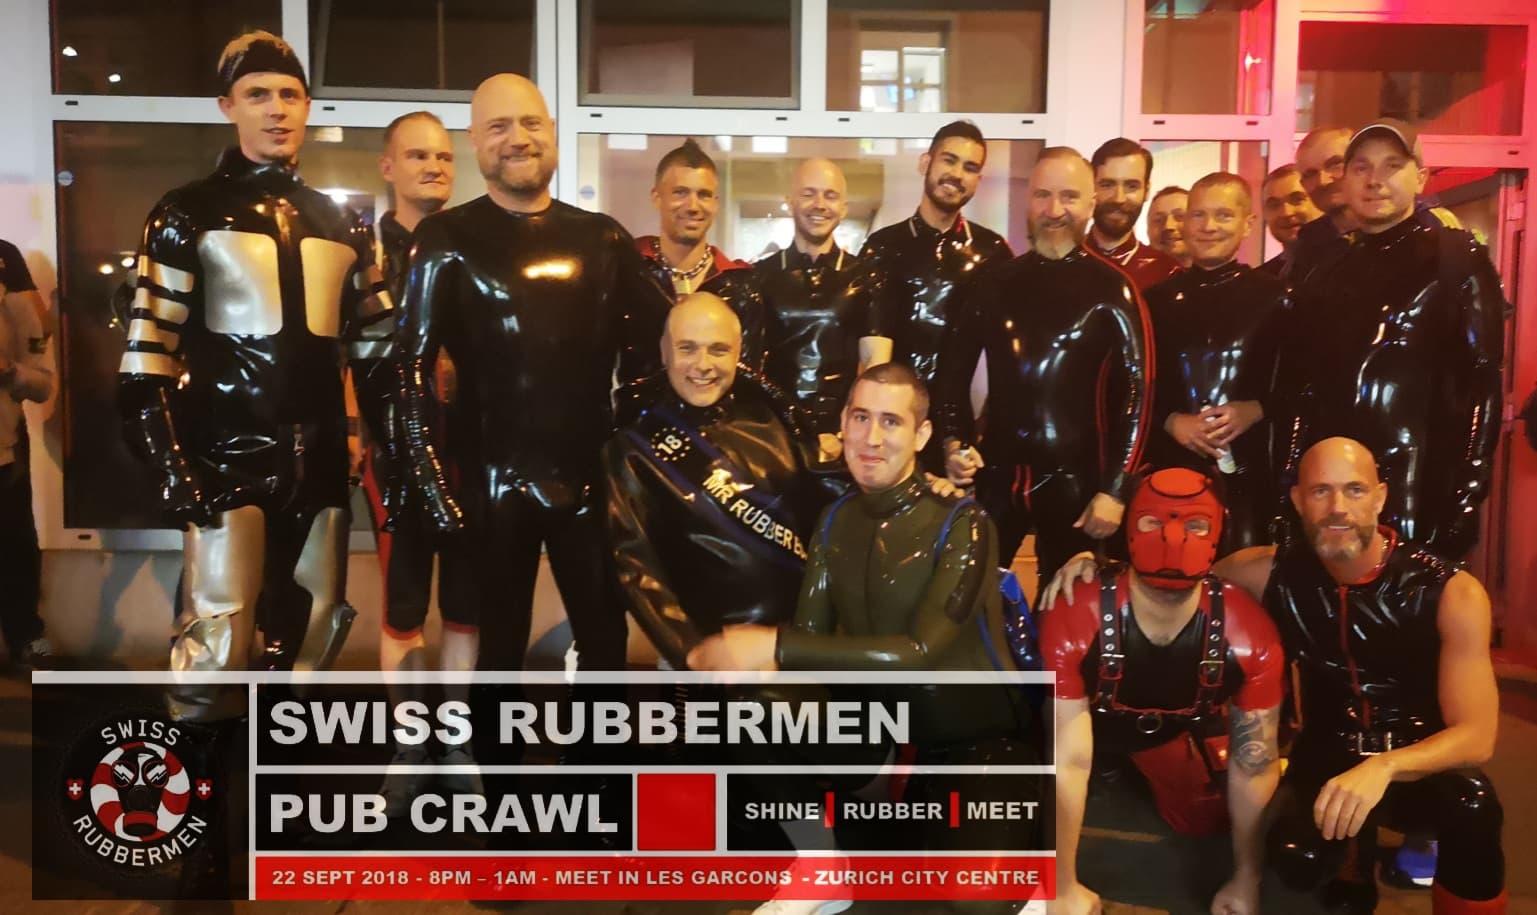 Swiss Rubbermen - Rubber Pub Crawl